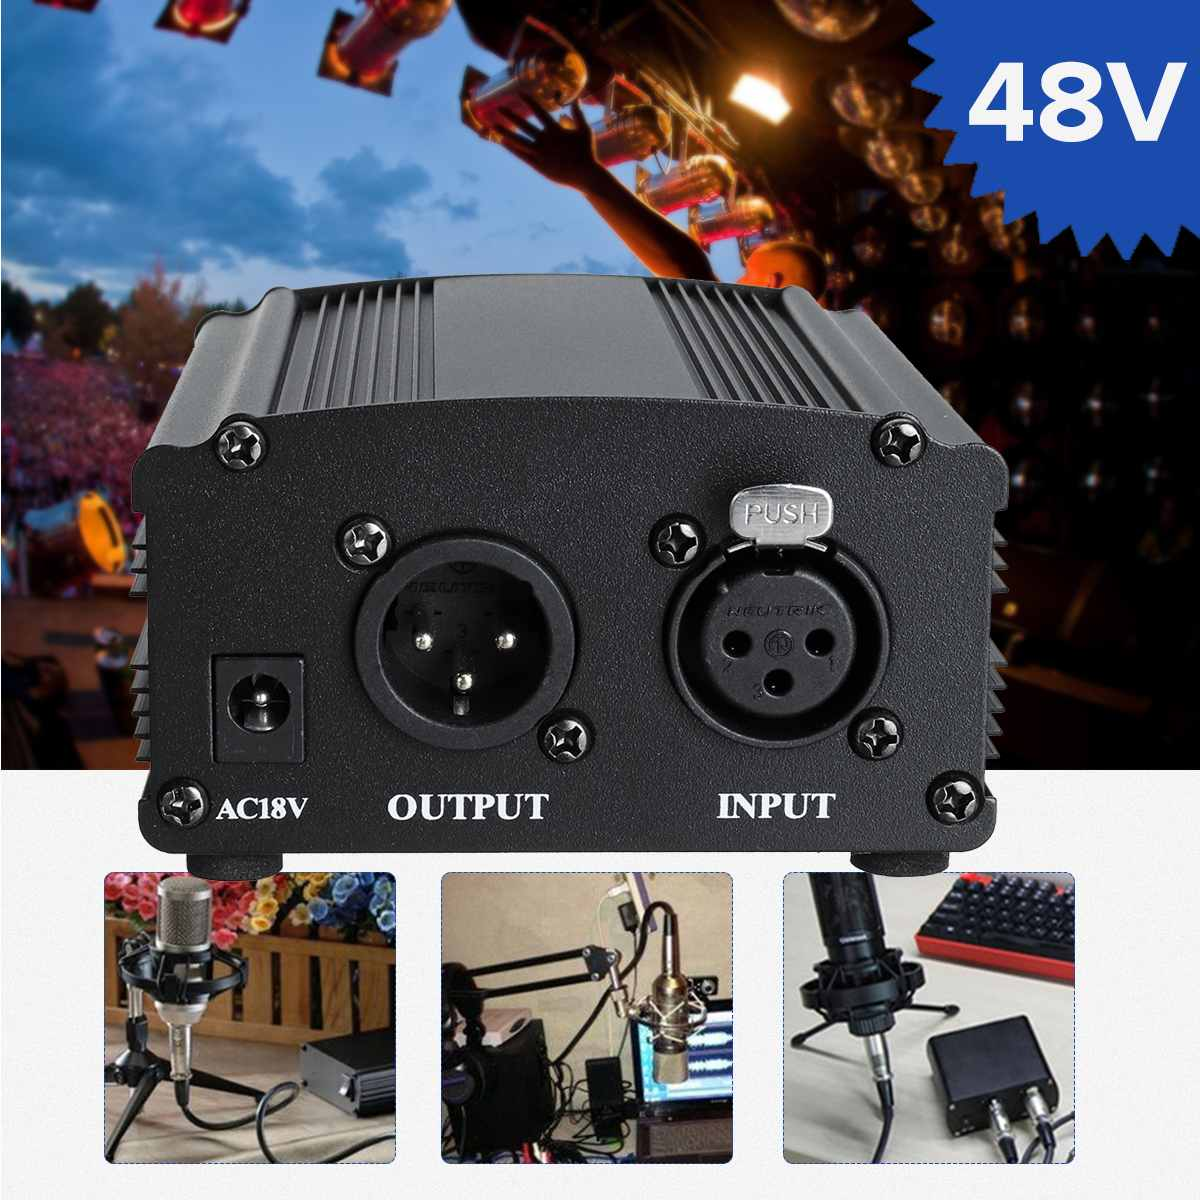 LEORY micrófono 48V Phantom Power 1,5 m Cable de alimentación de bajo ruido para Audio micrófono condensador de grabación equipo